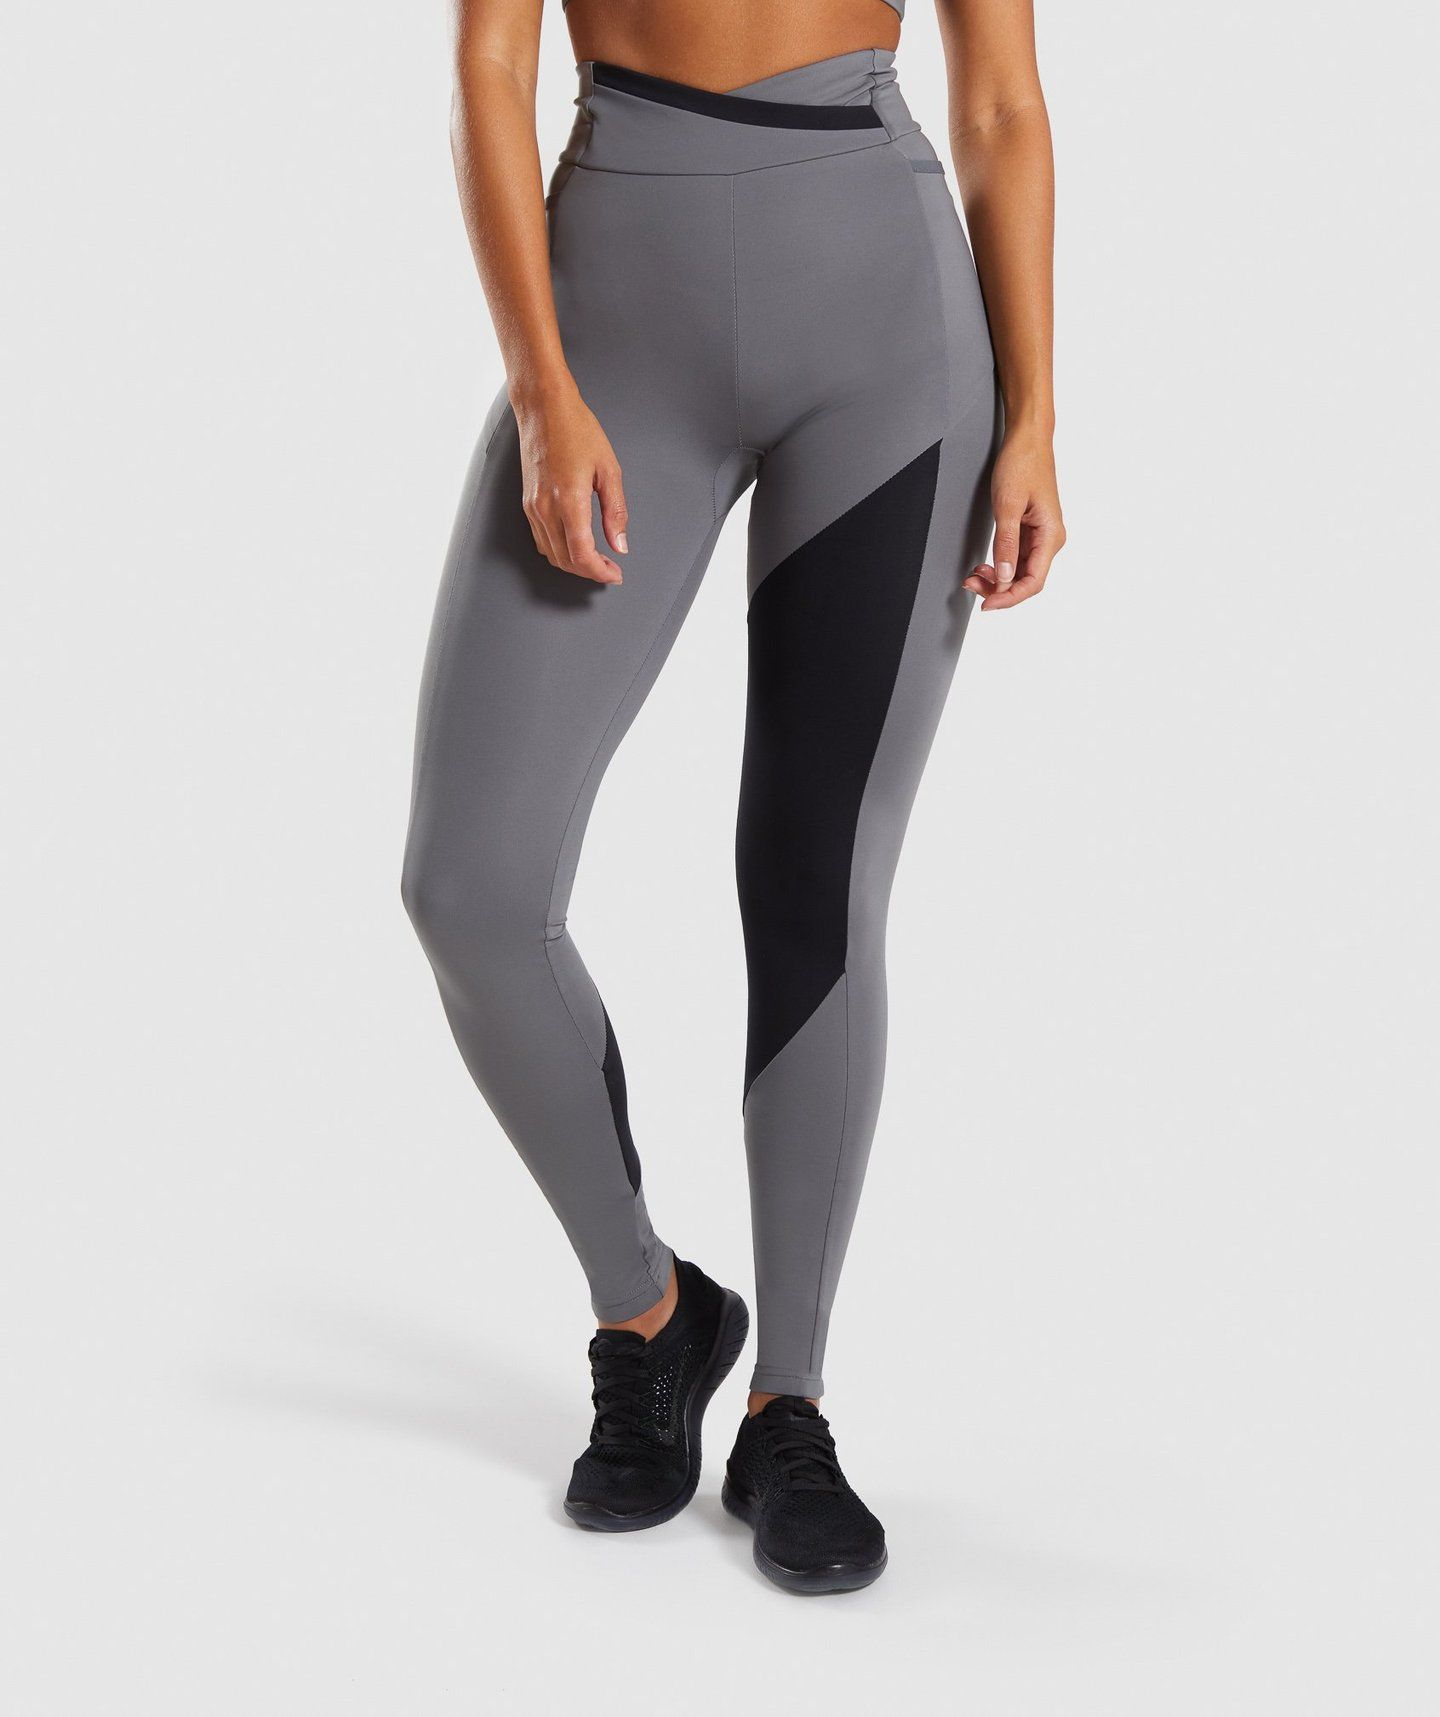 e71767f79e4a7 Gymshark Asymmetric Leggings - Smokey Grey/Black in 2019   i love ...